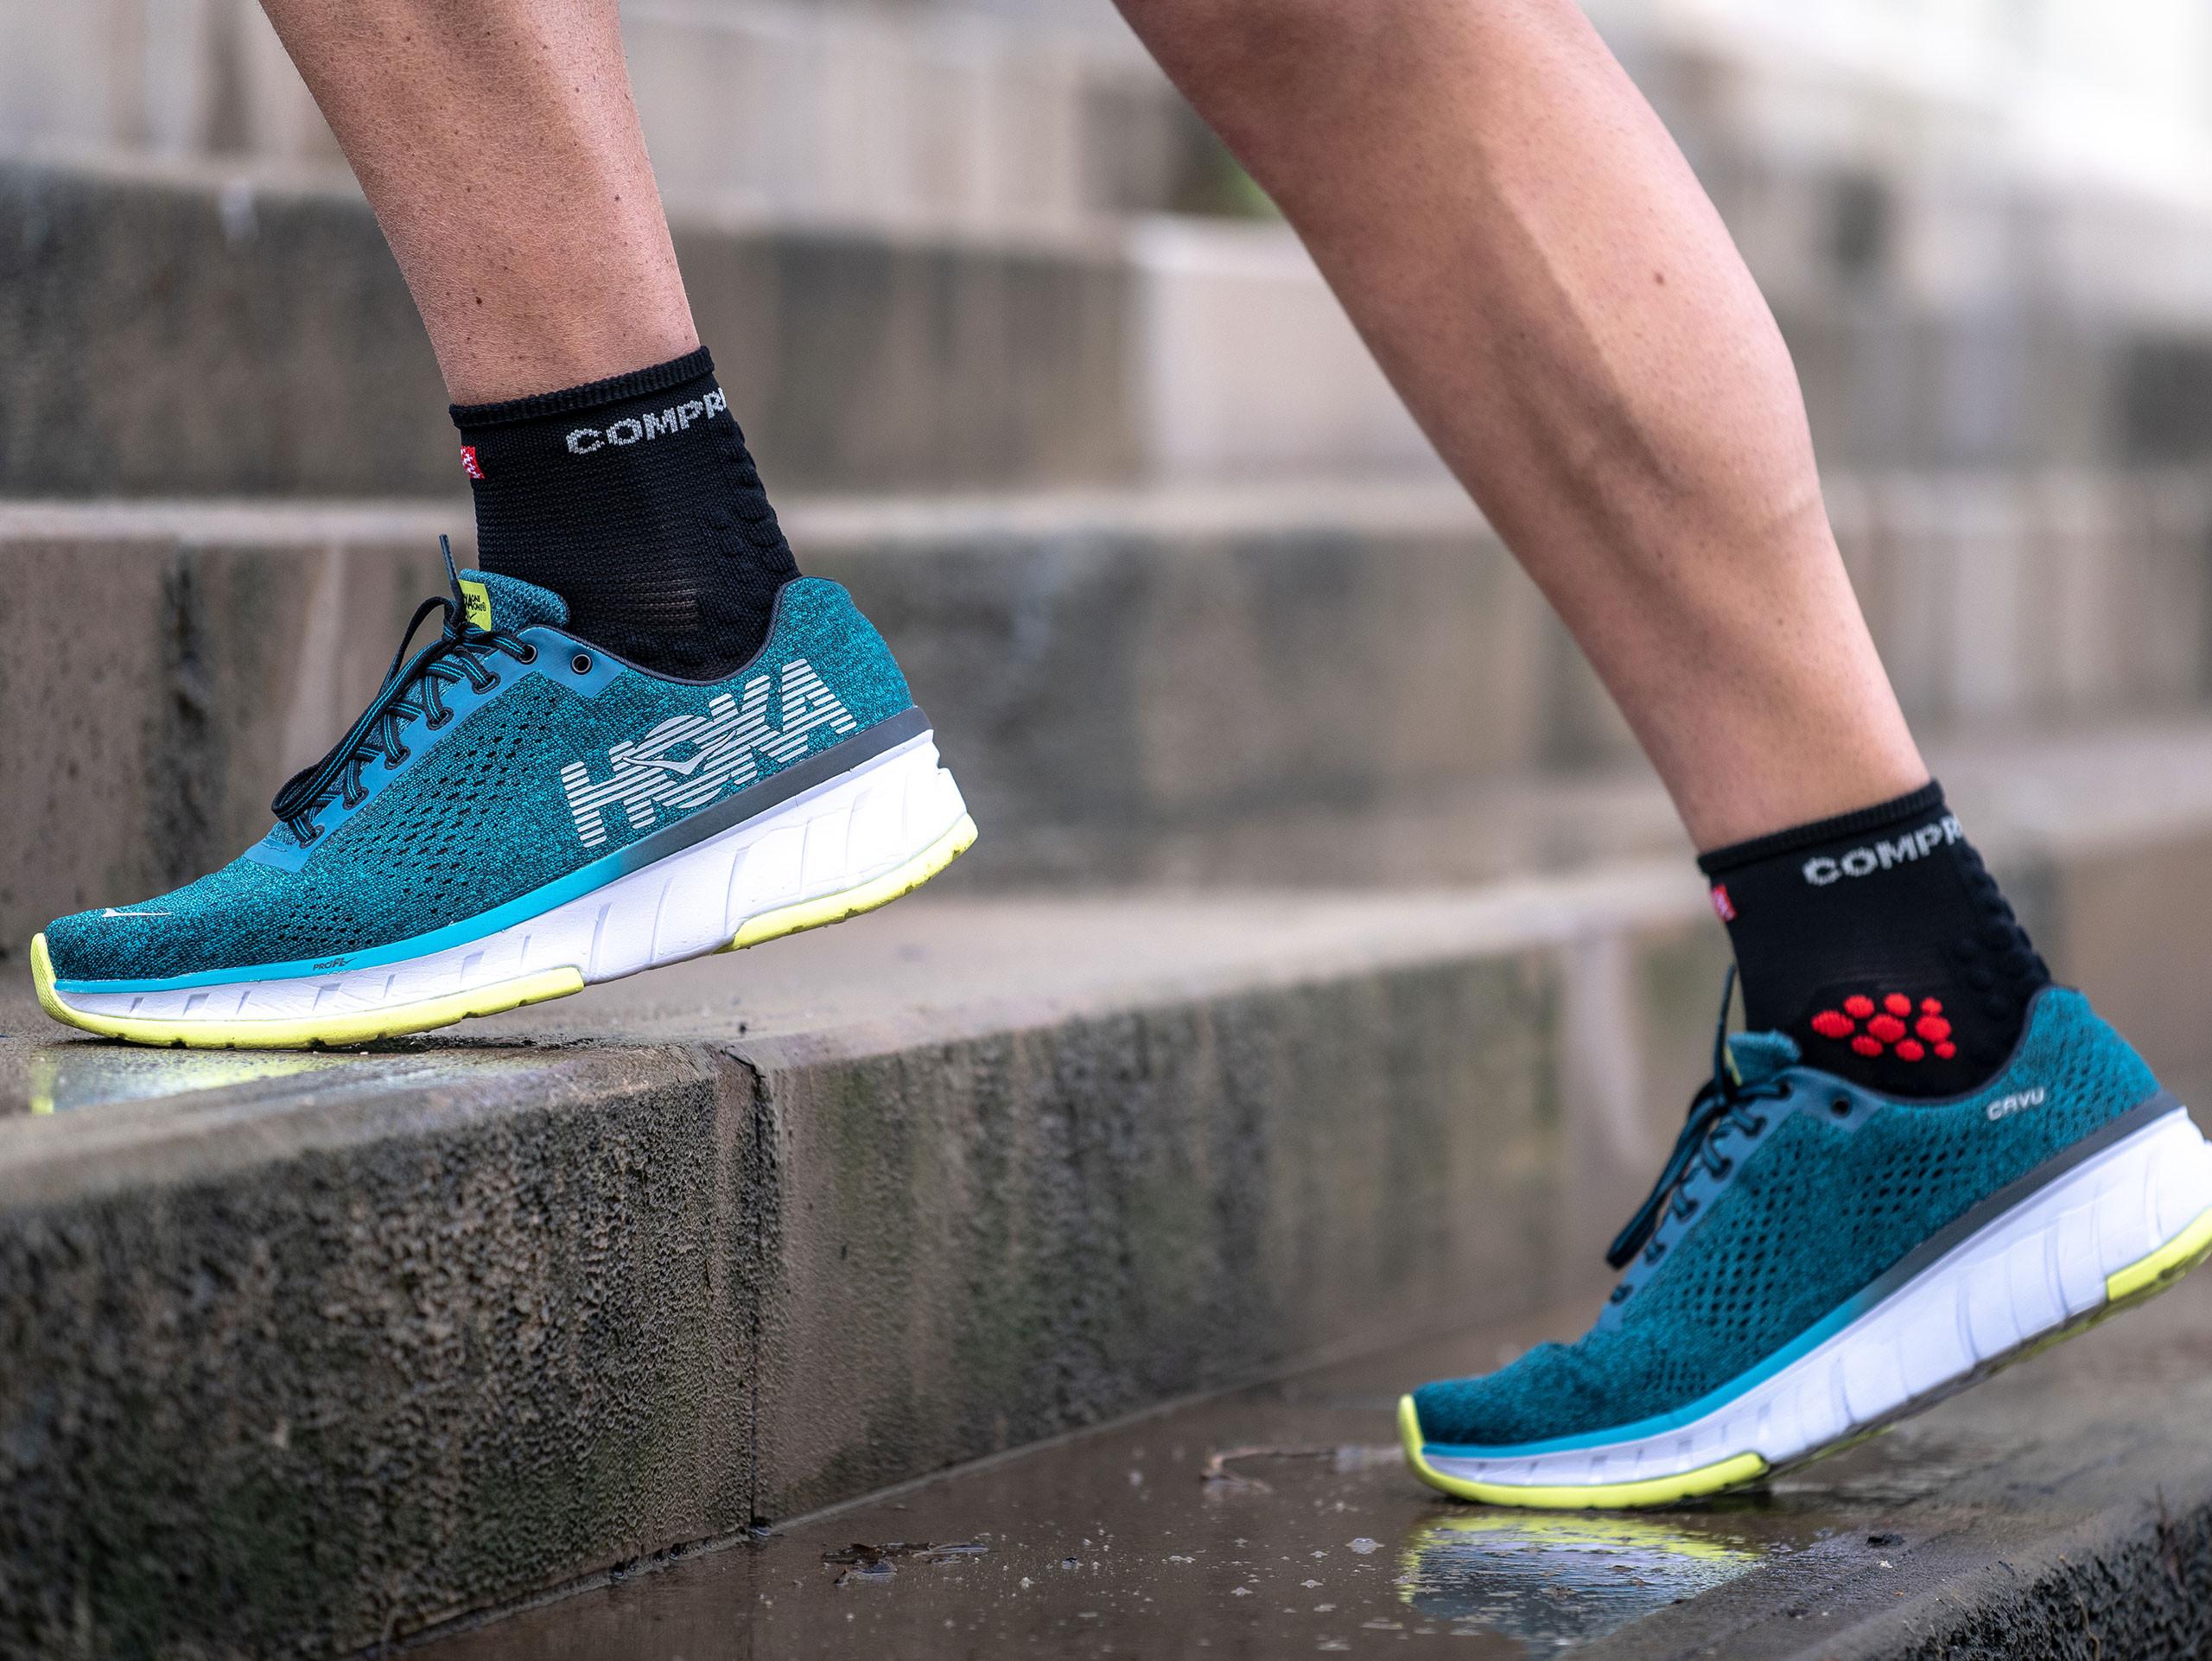 Pro Racing Socks v3.0 Run High BLACK